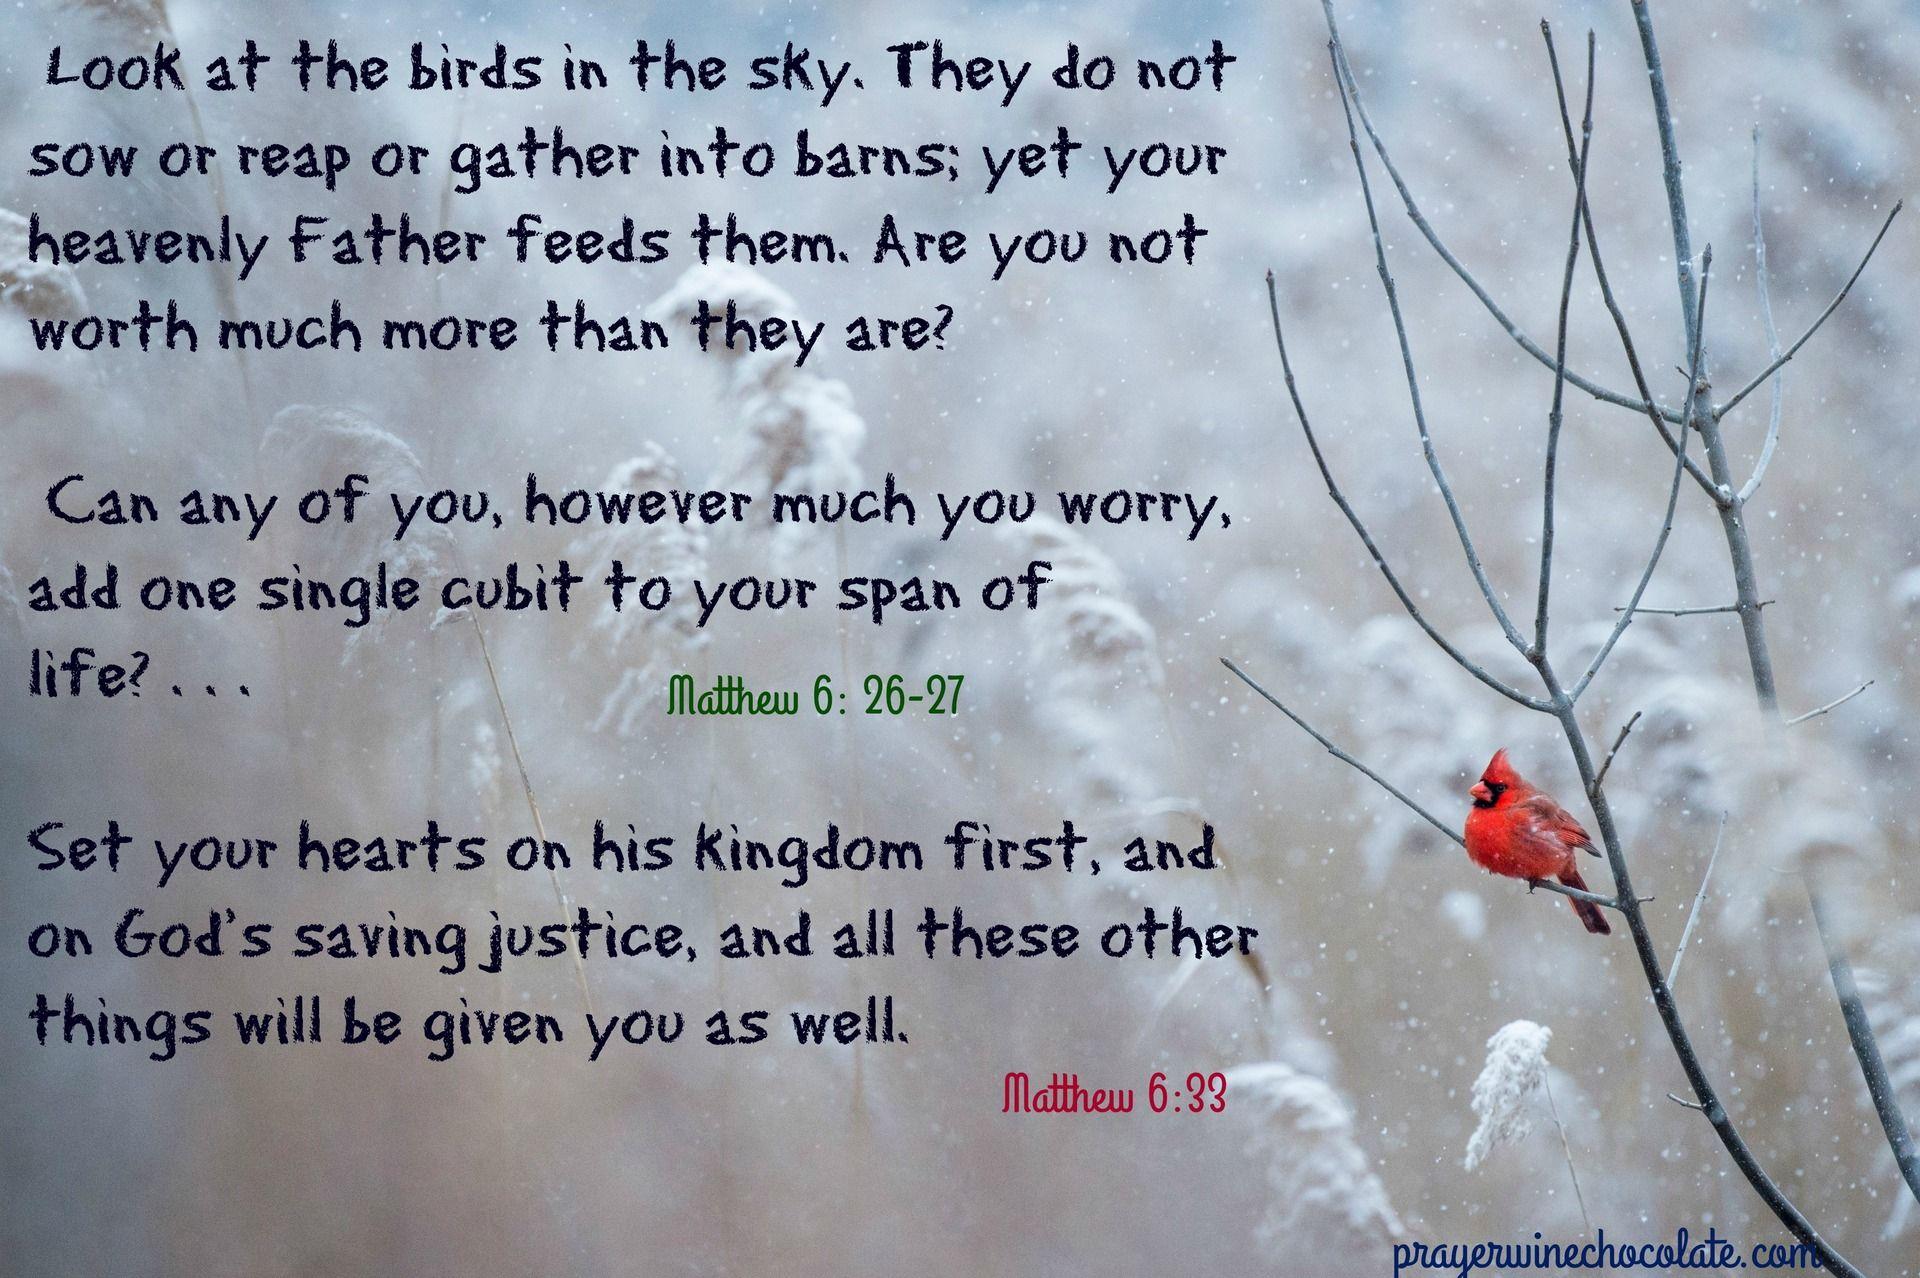 birdwintercardinalGodprovides.jpg